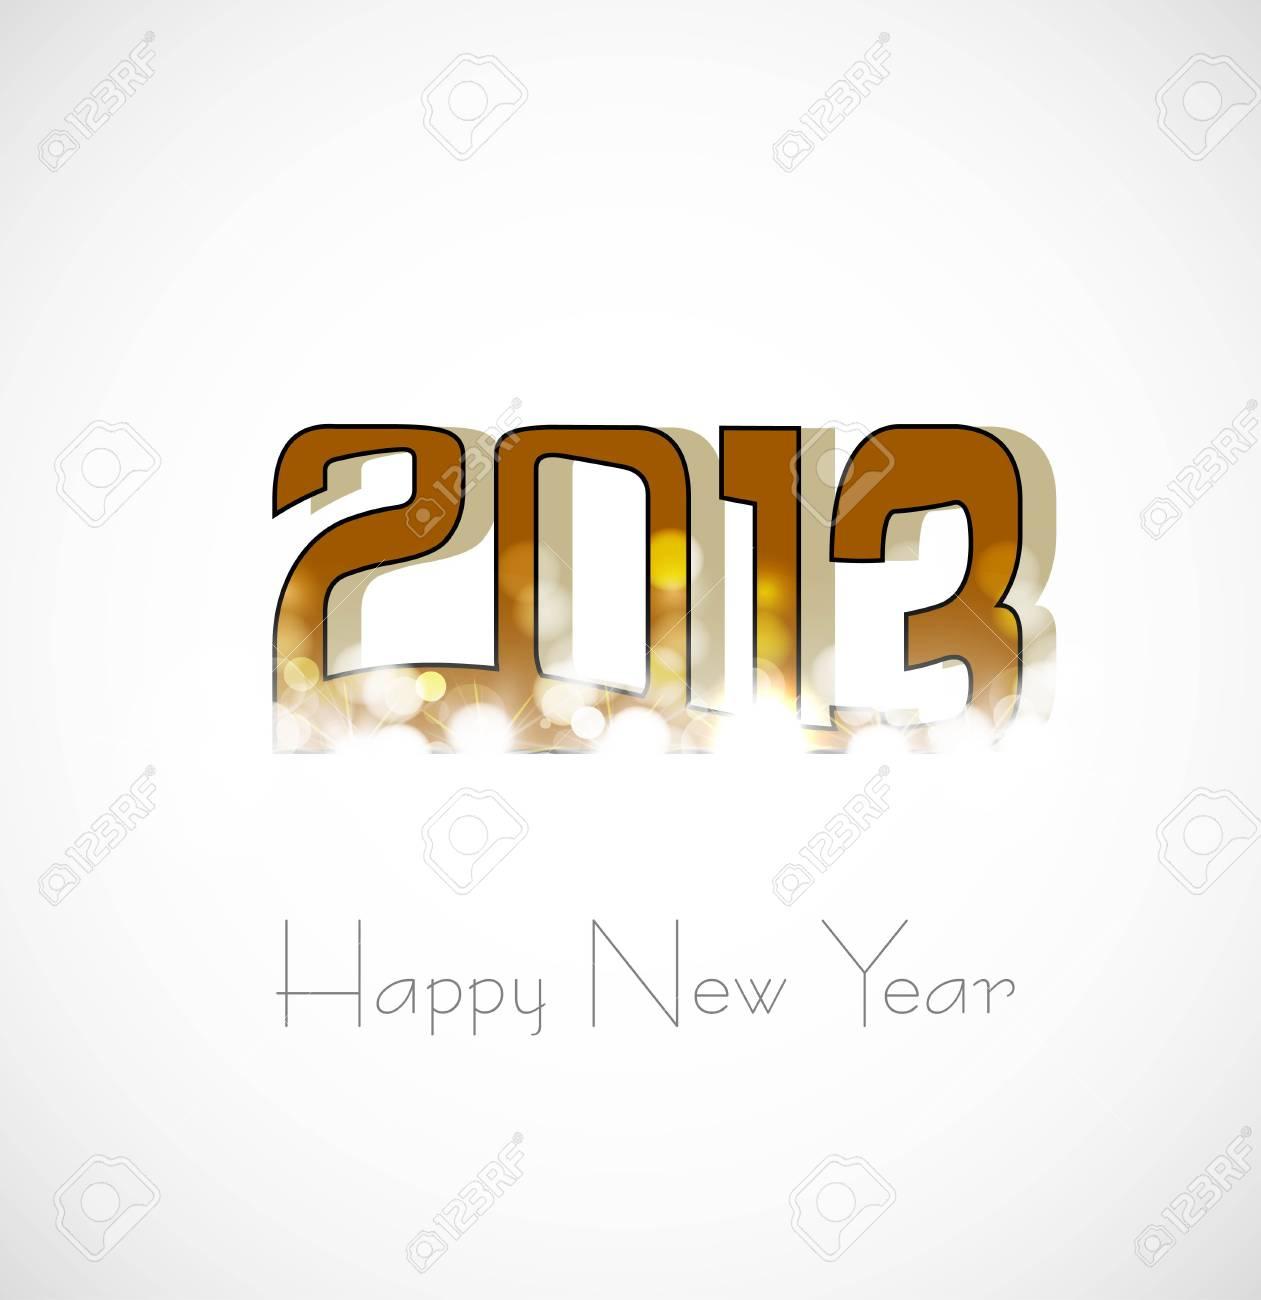 new year creative 2013 artistic design Stock Vector - 17945522